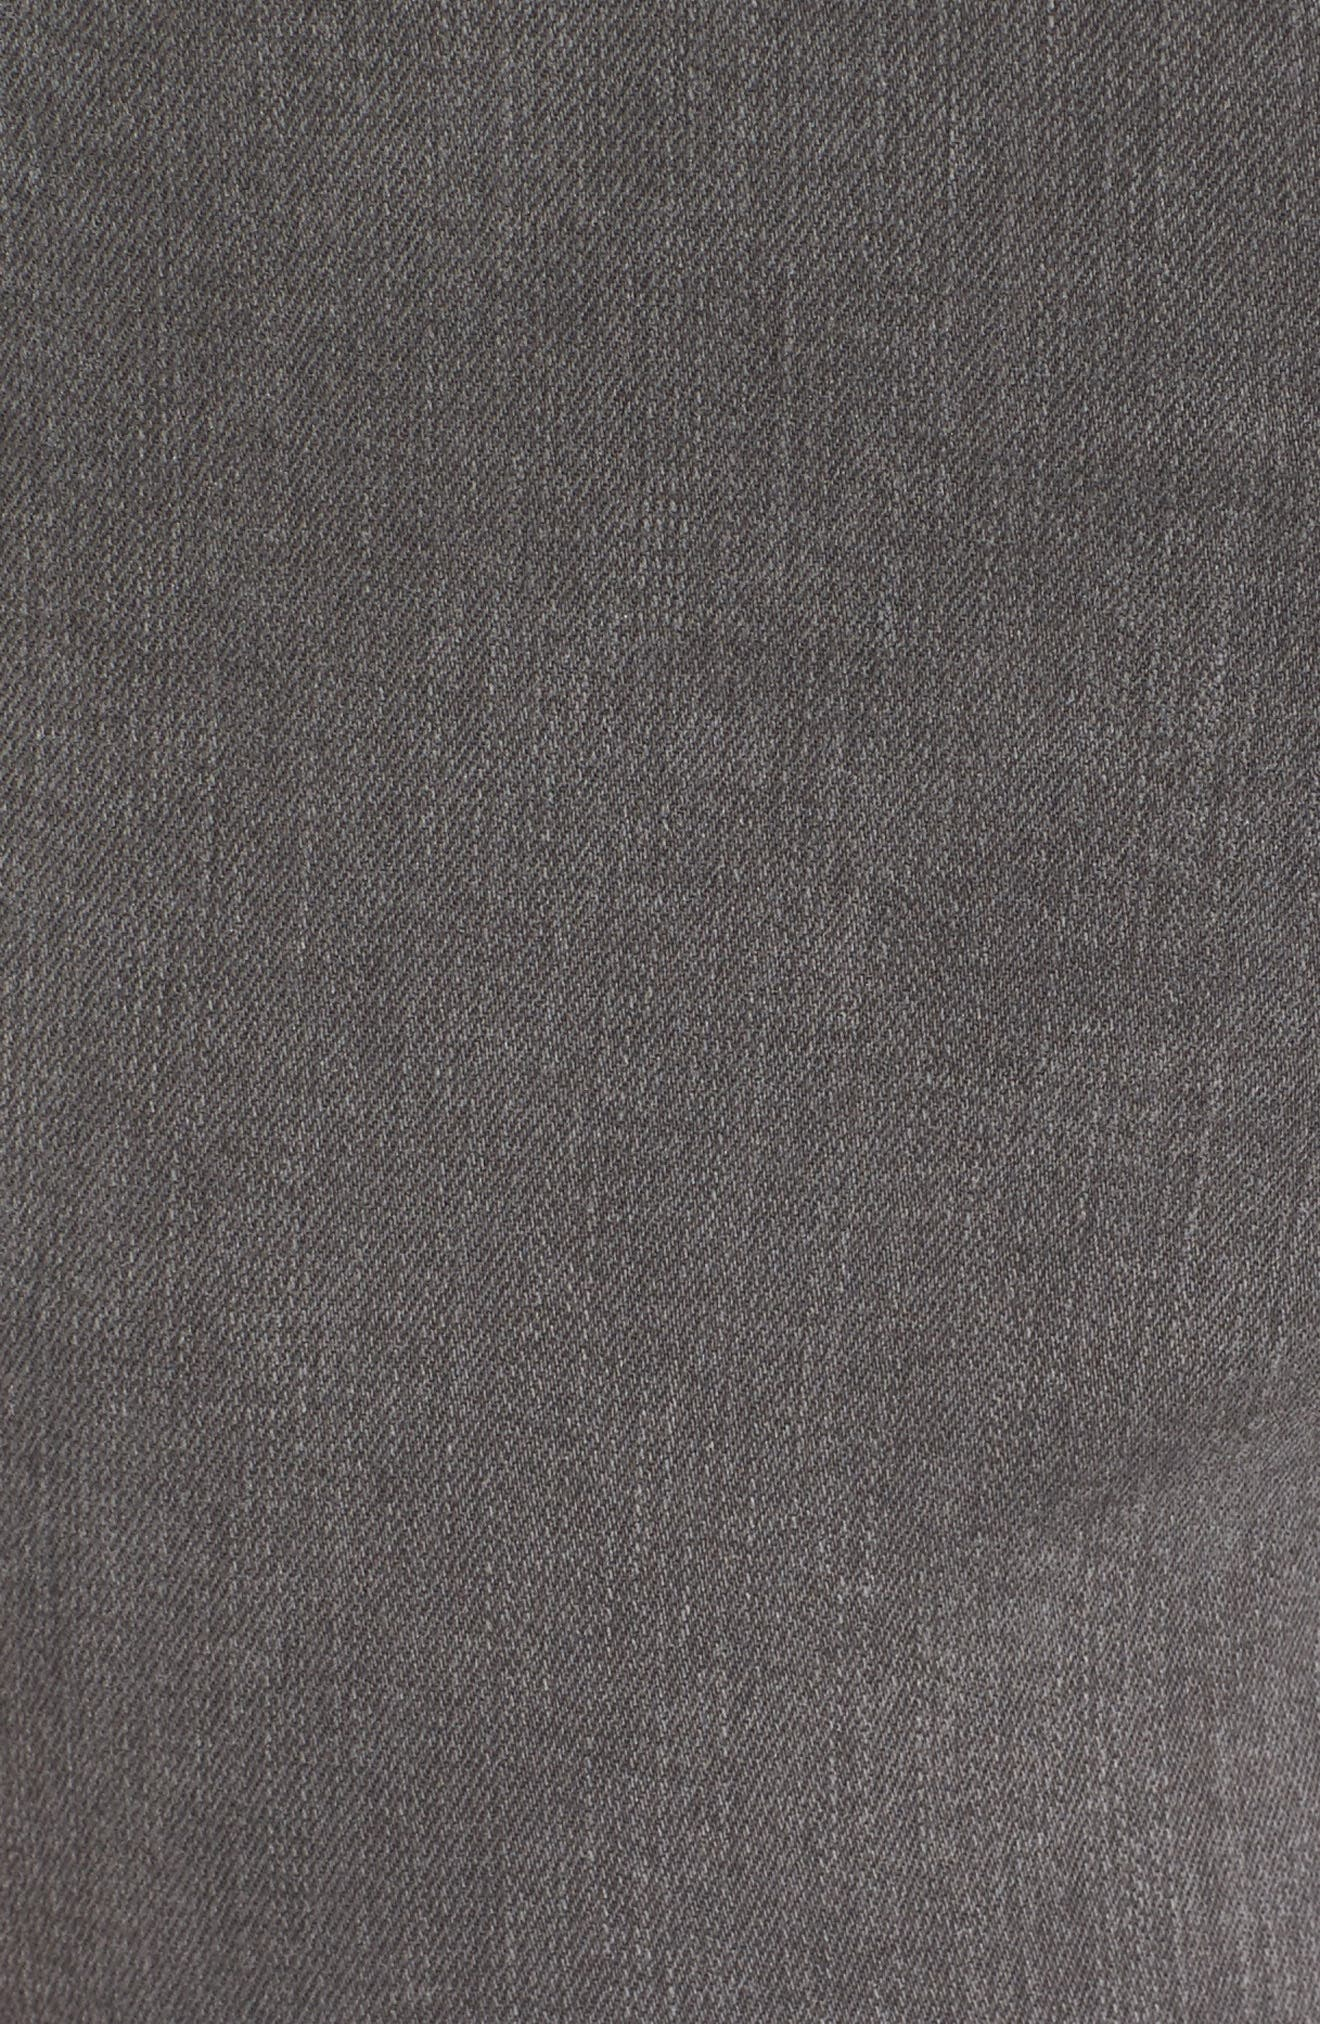 Ami Frayed Hem Stretch Skinny Ankle Jeans,                             Alternate thumbnail 5, color,                             038